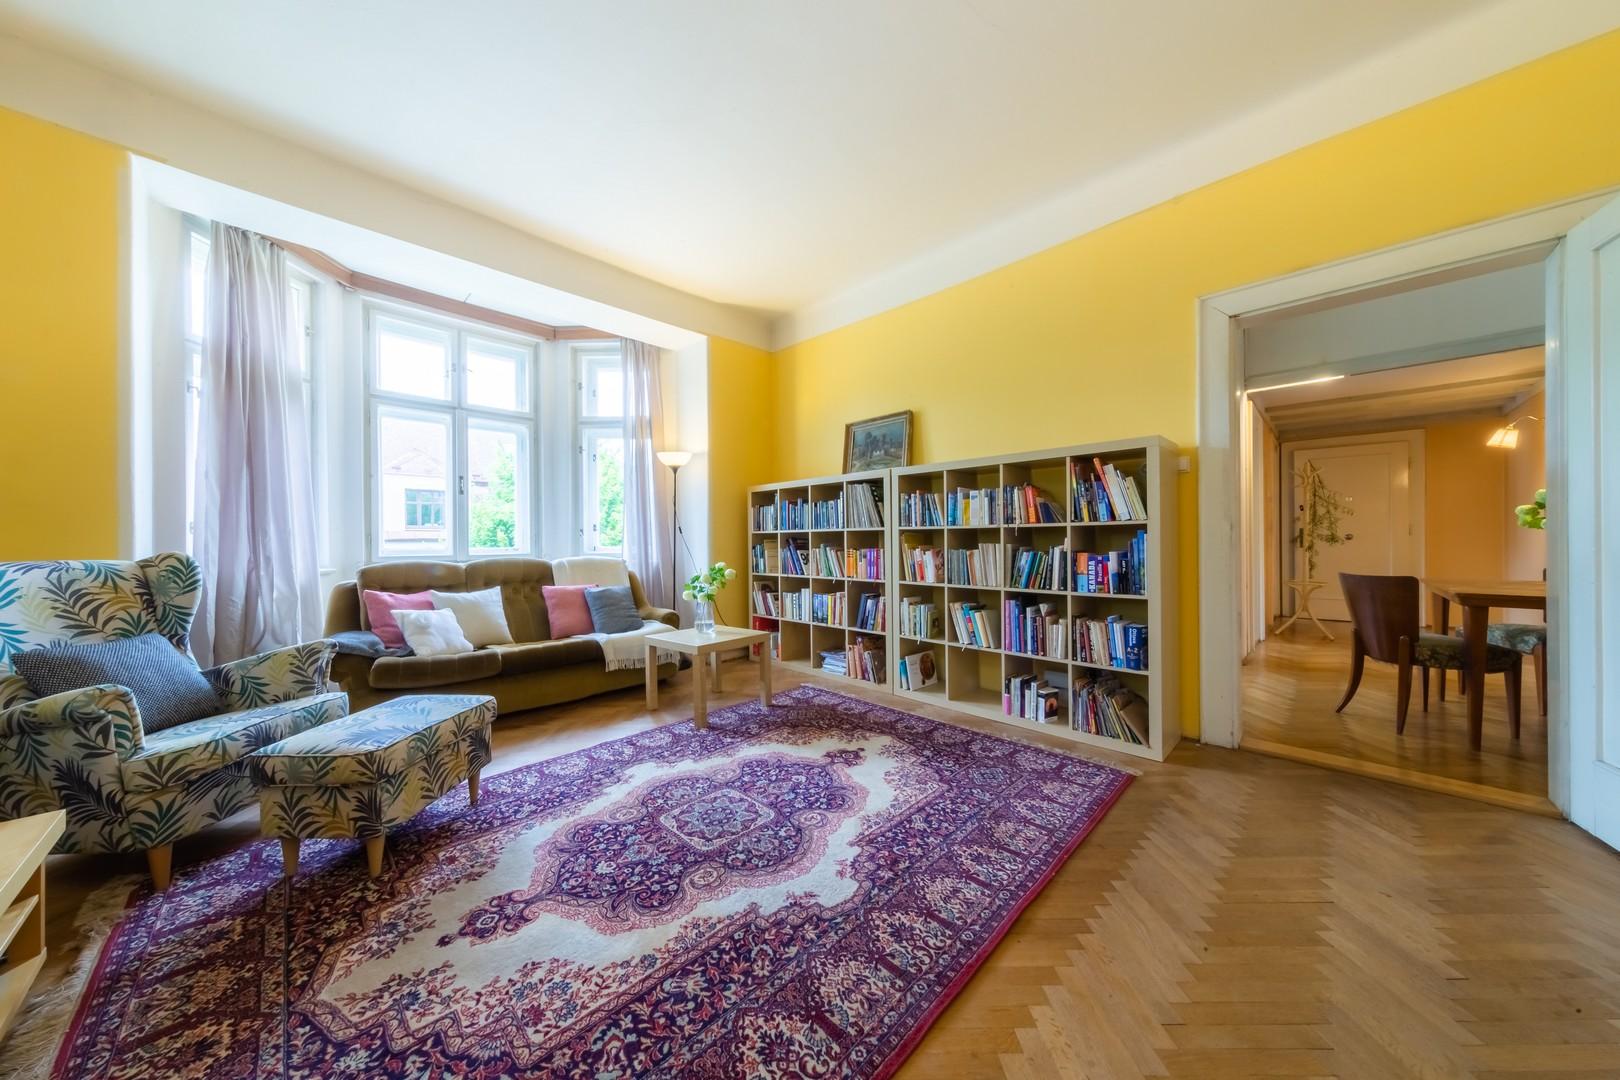 knihovna zidle parkety koberec kreslo knihovna kniha obraz